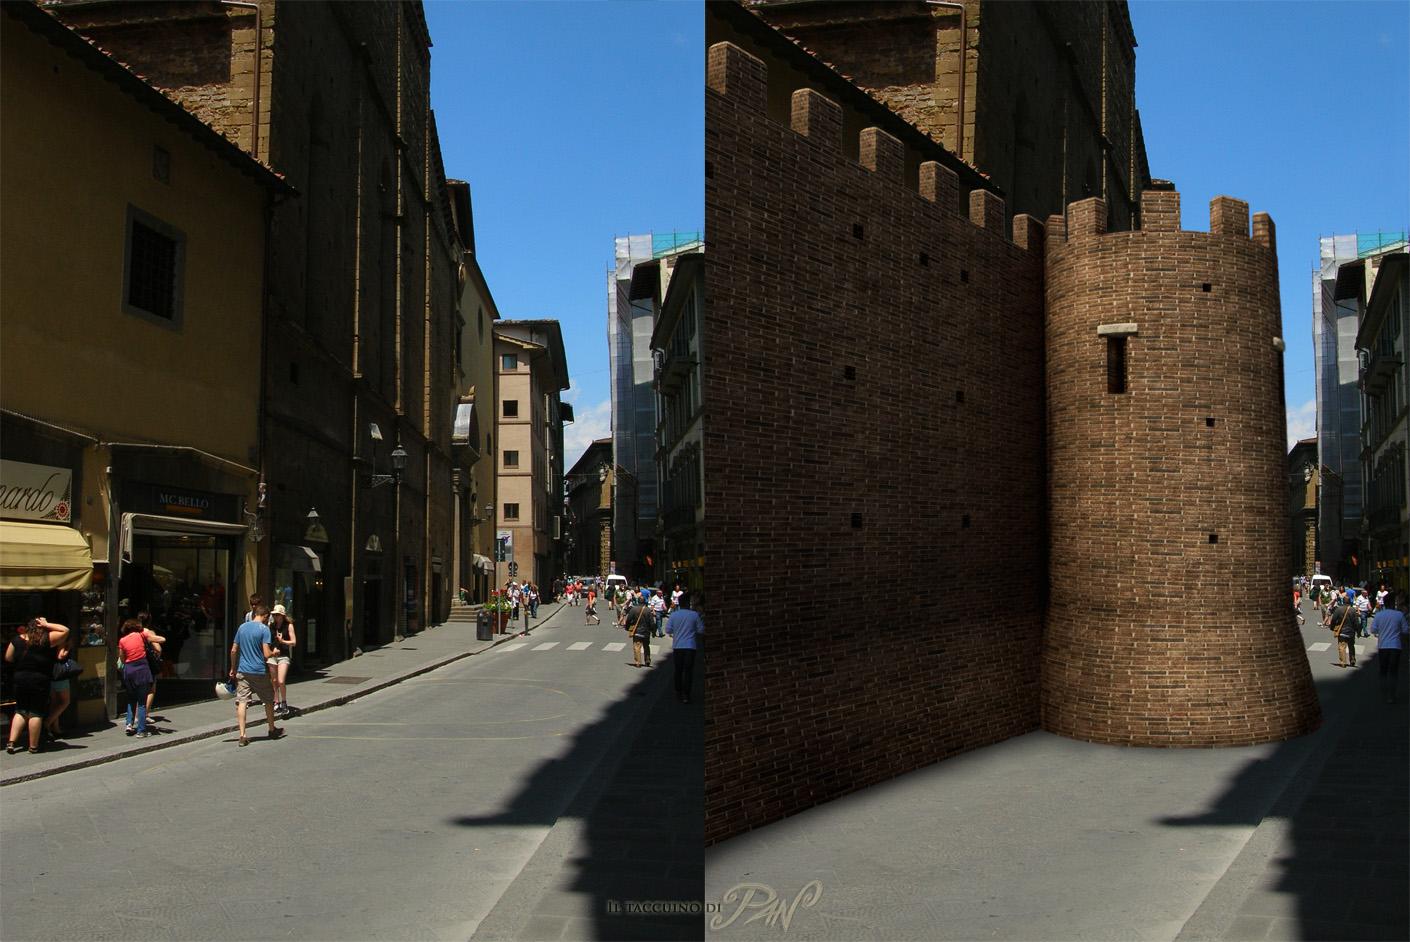 Roman defensive walls (Florence) by Panaiotis